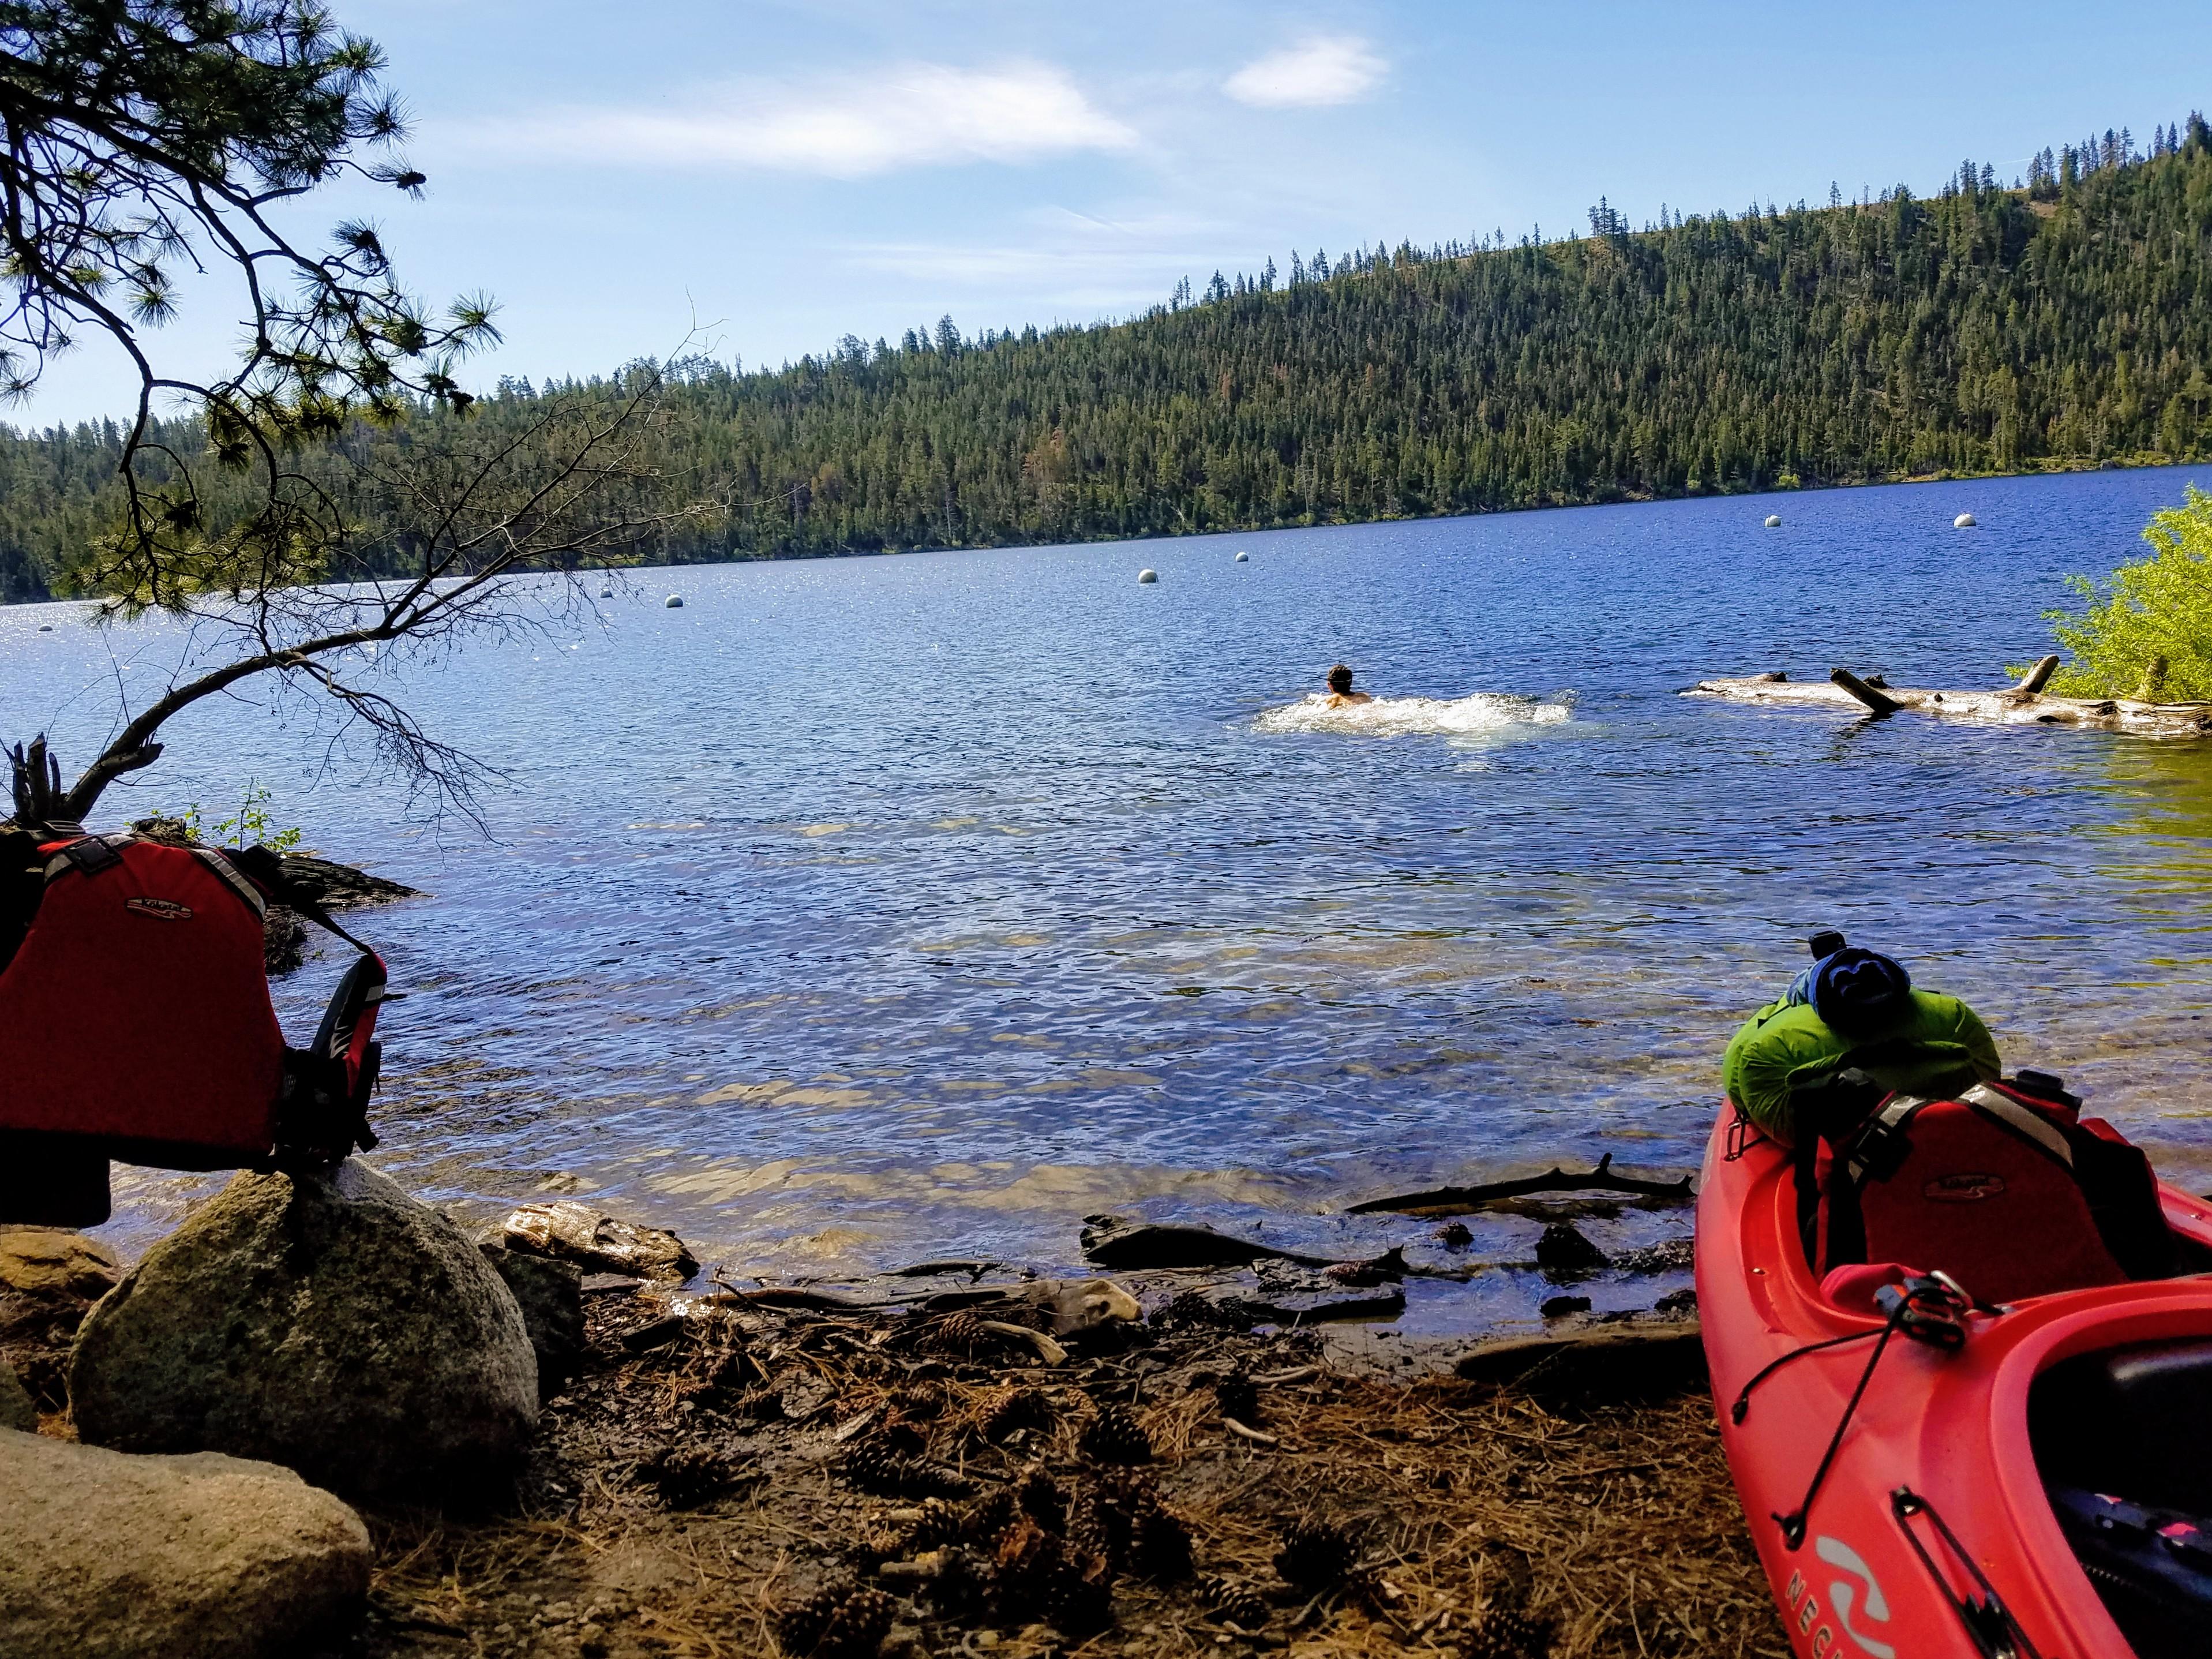 Emerald Bay Boat Camp